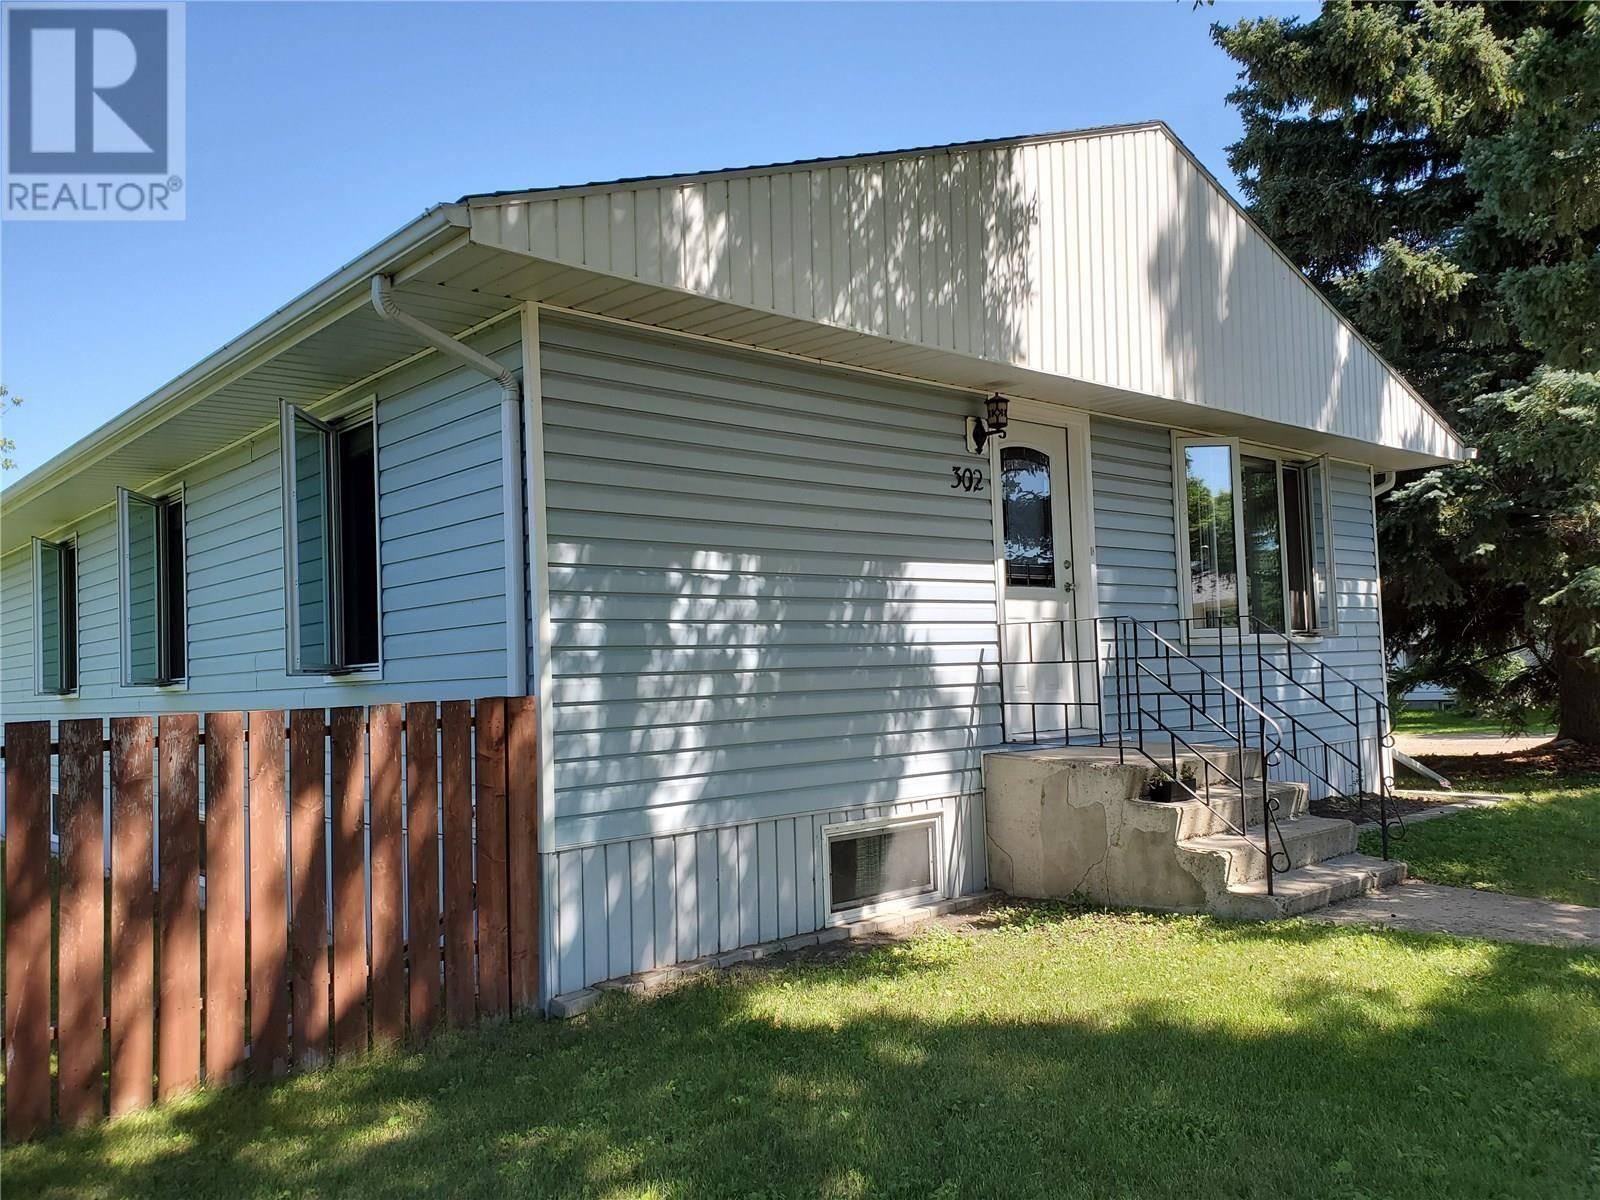 House for sale at 302 5th Ave W Watrous Saskatchewan - MLS: SK766452